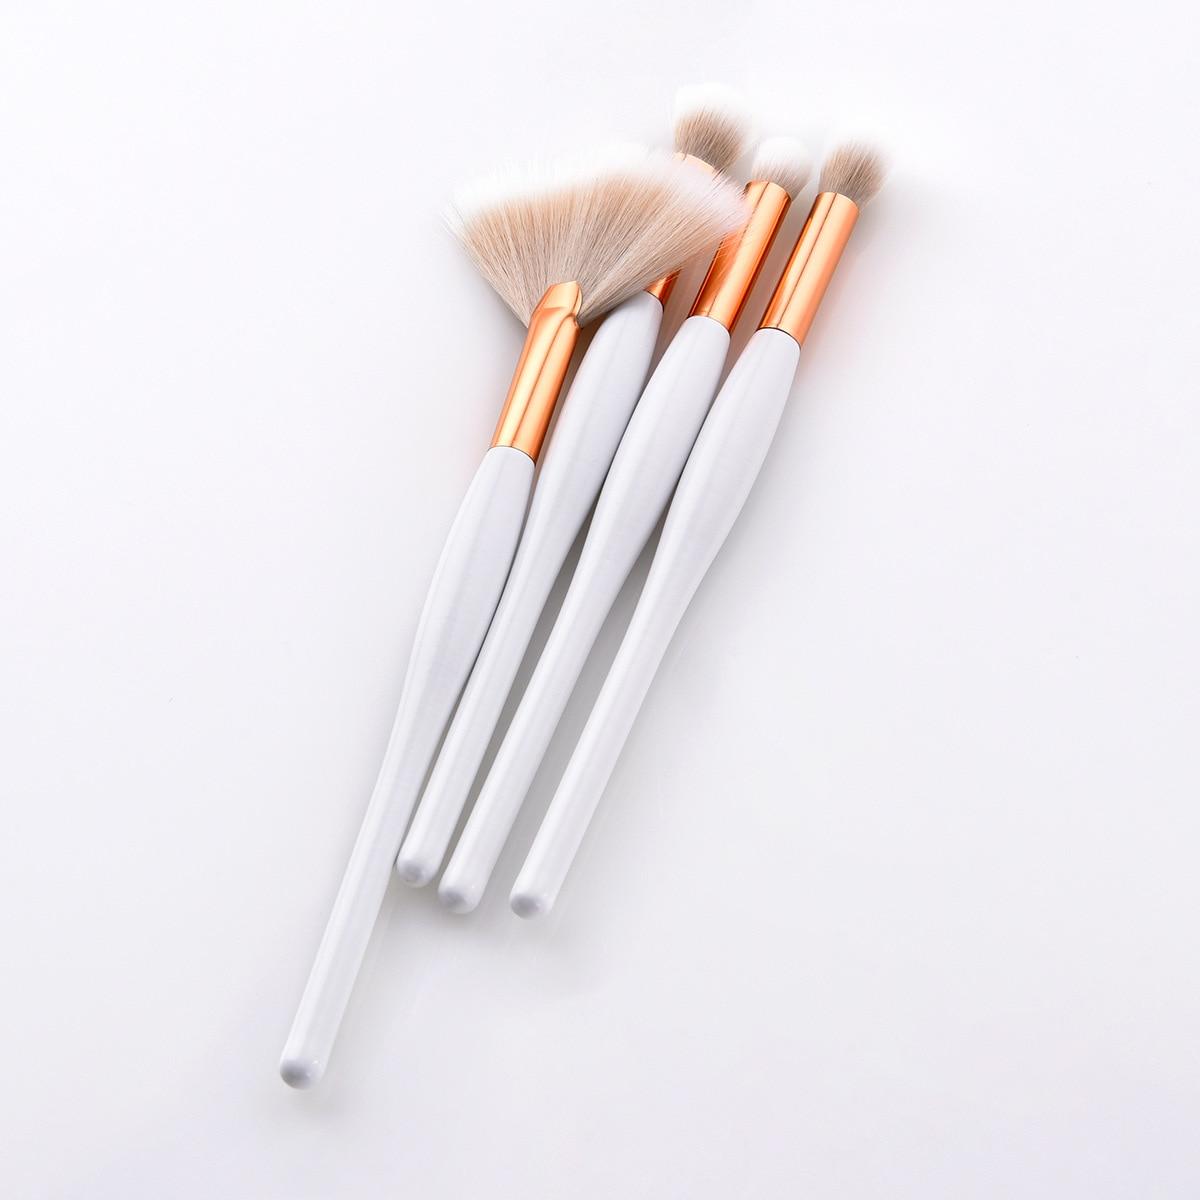 Tesoura de Maquiagem de beleza chama fã pó Handle Material : Natural Wood High Quality